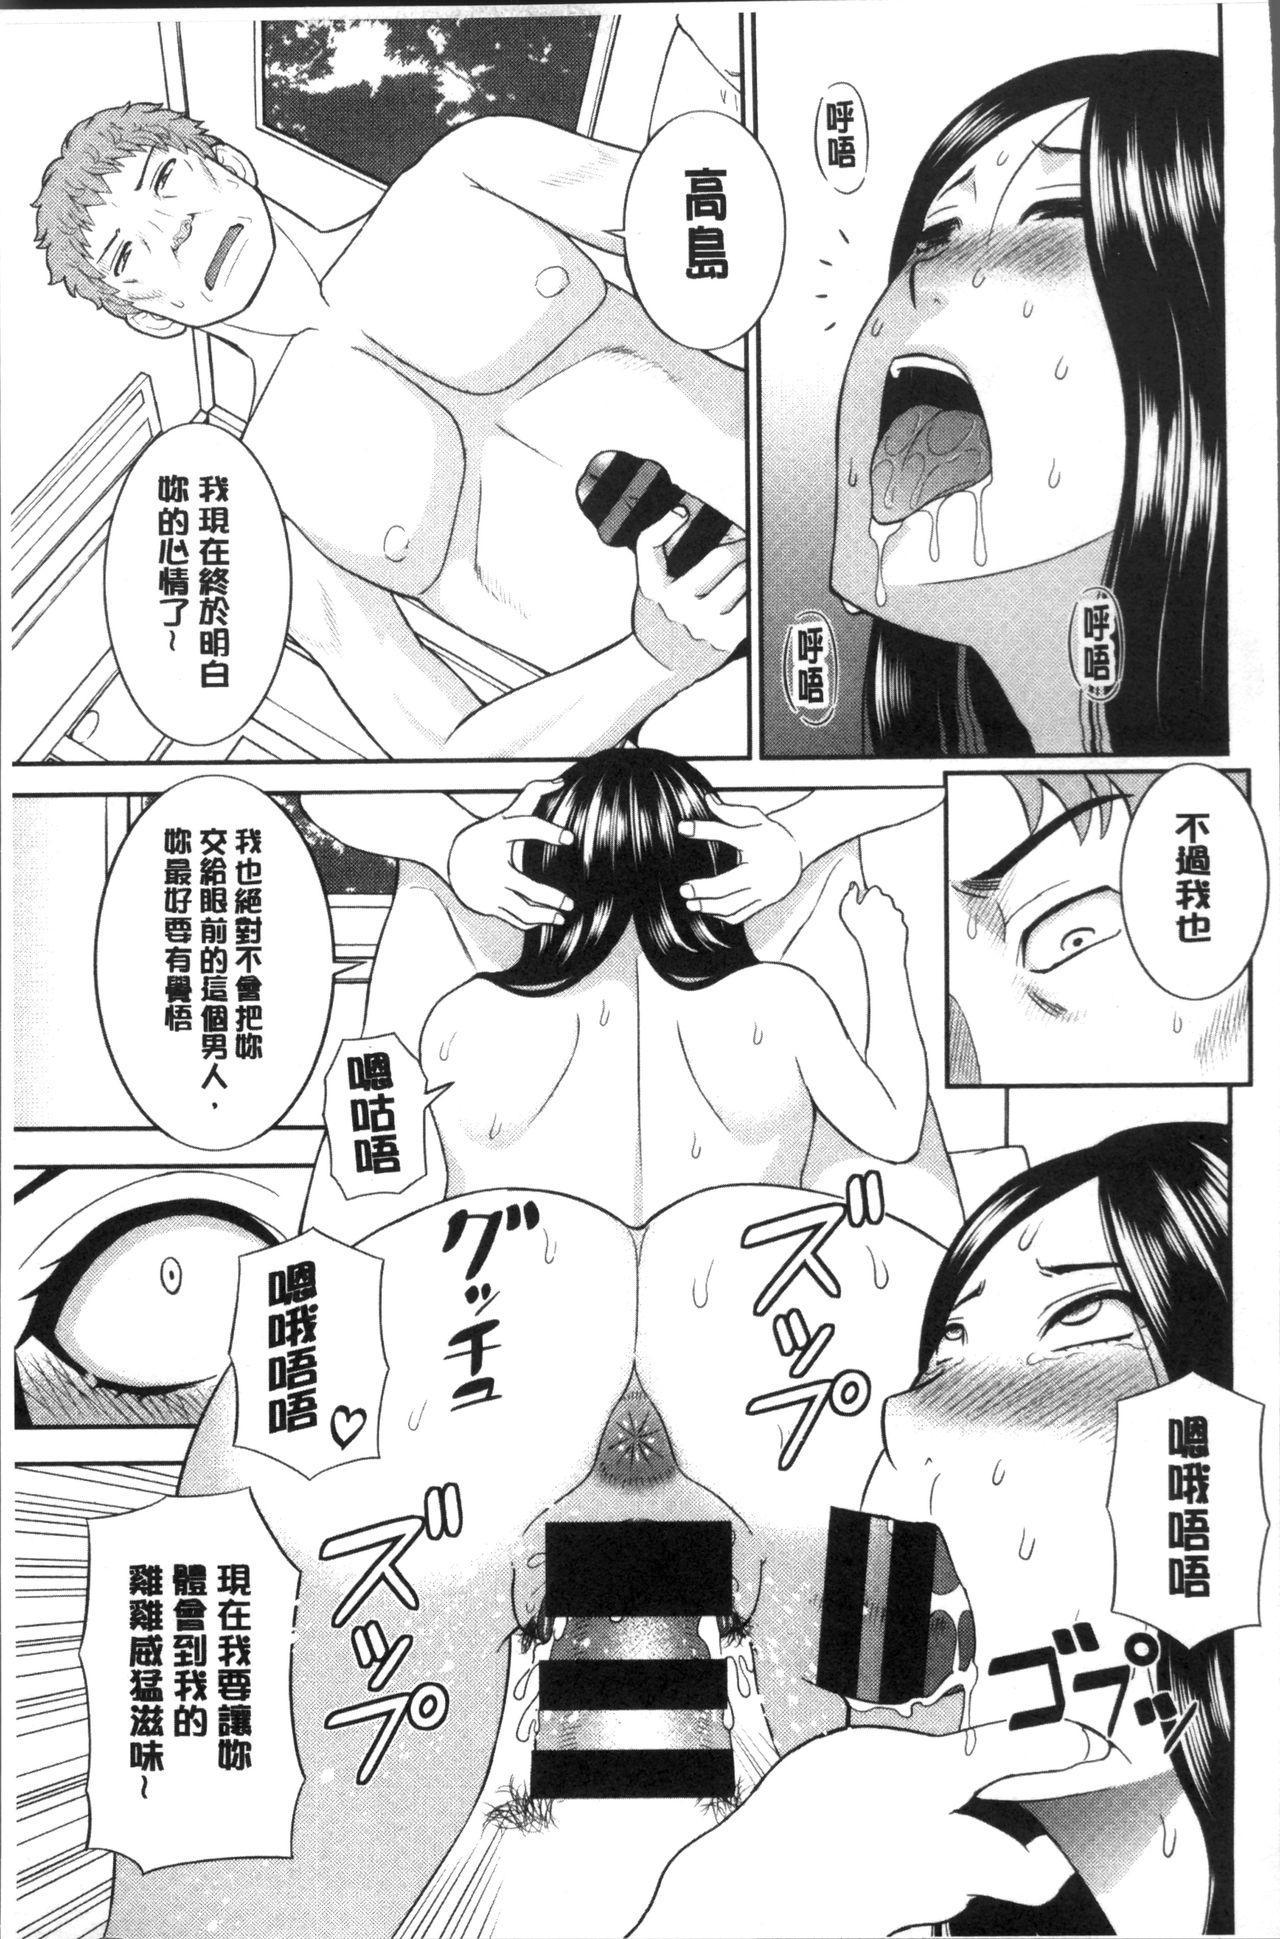 [Kawamori Misaki] Innyuu Shufu no Futei Ganbou - Oku-san to Kanojo to 2 | 淫乳主婦的不貞願望 和人妻也和女友❤2 [Chinese] 146